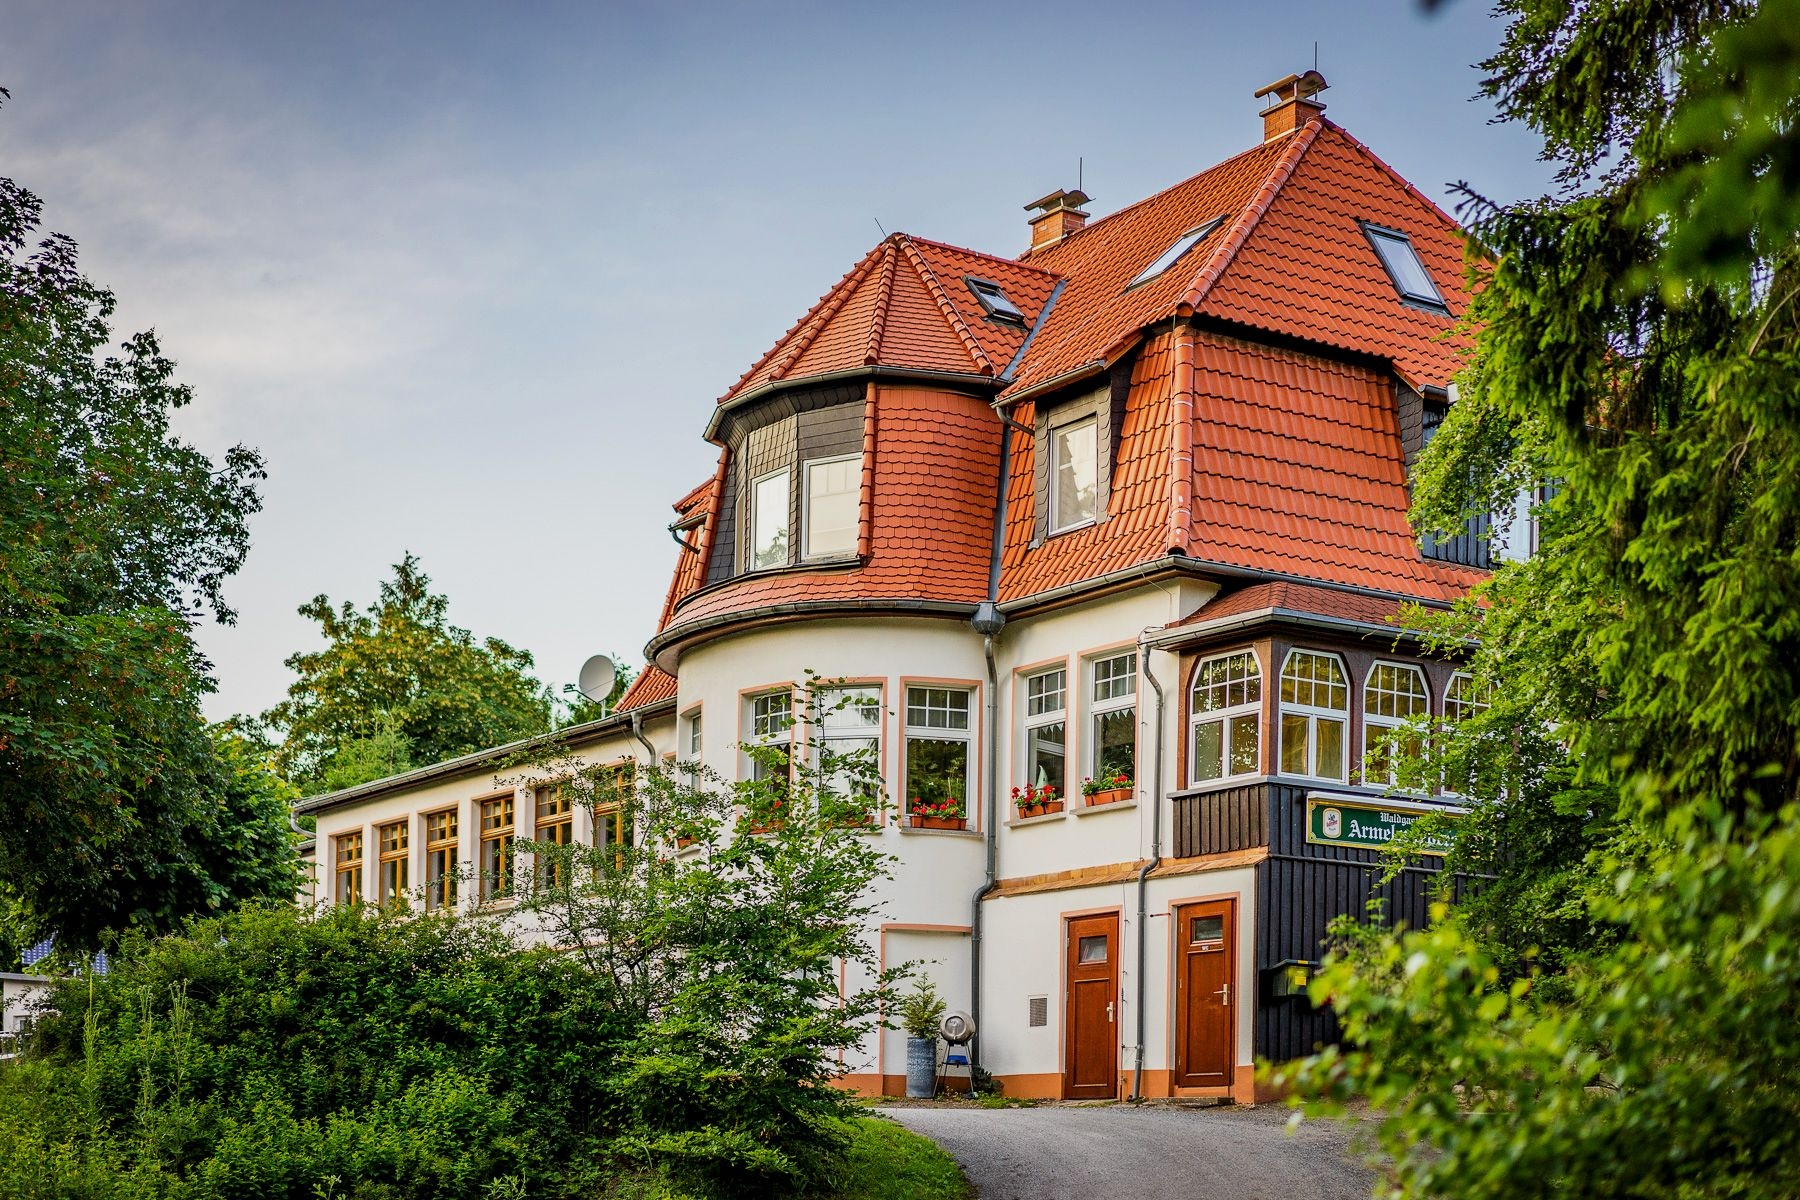 Waldgasthaus Armeleuteberg